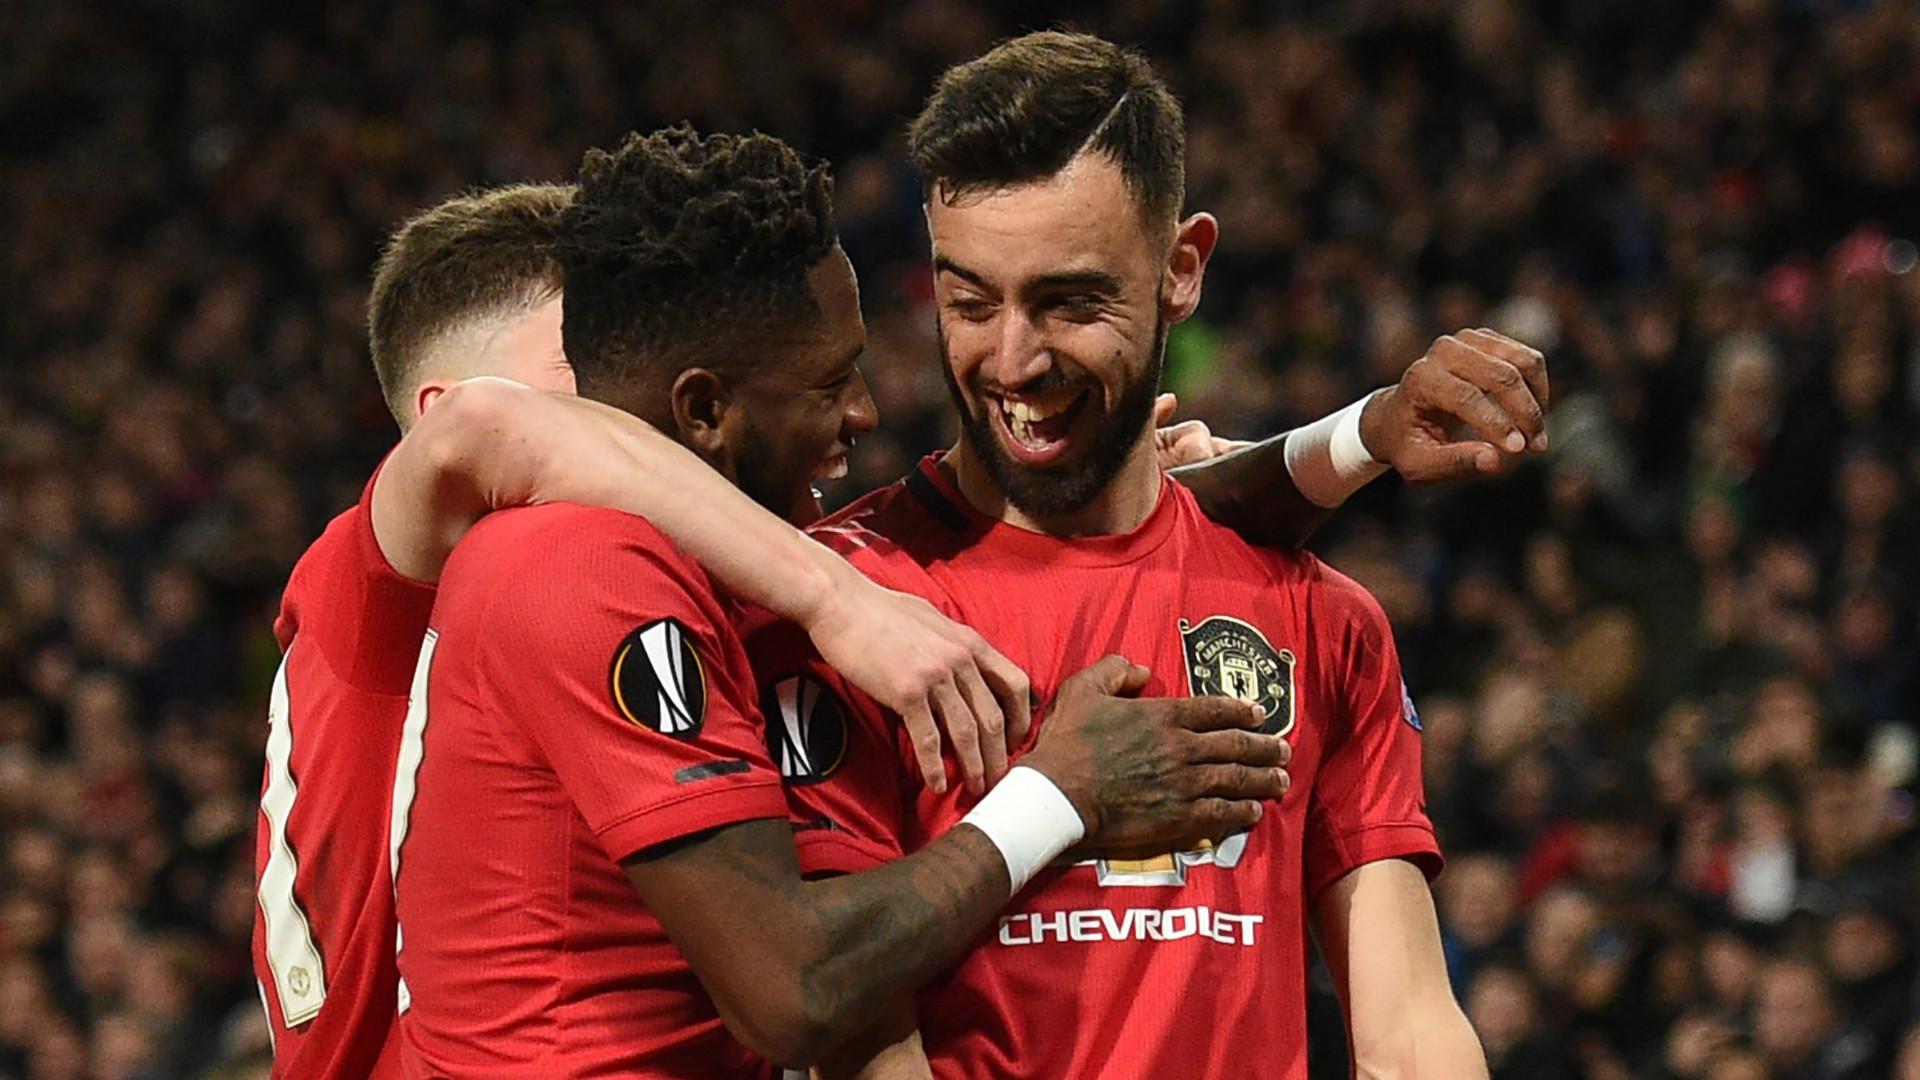 Laporan Pertandingan Manchester United Vs Club Brugge